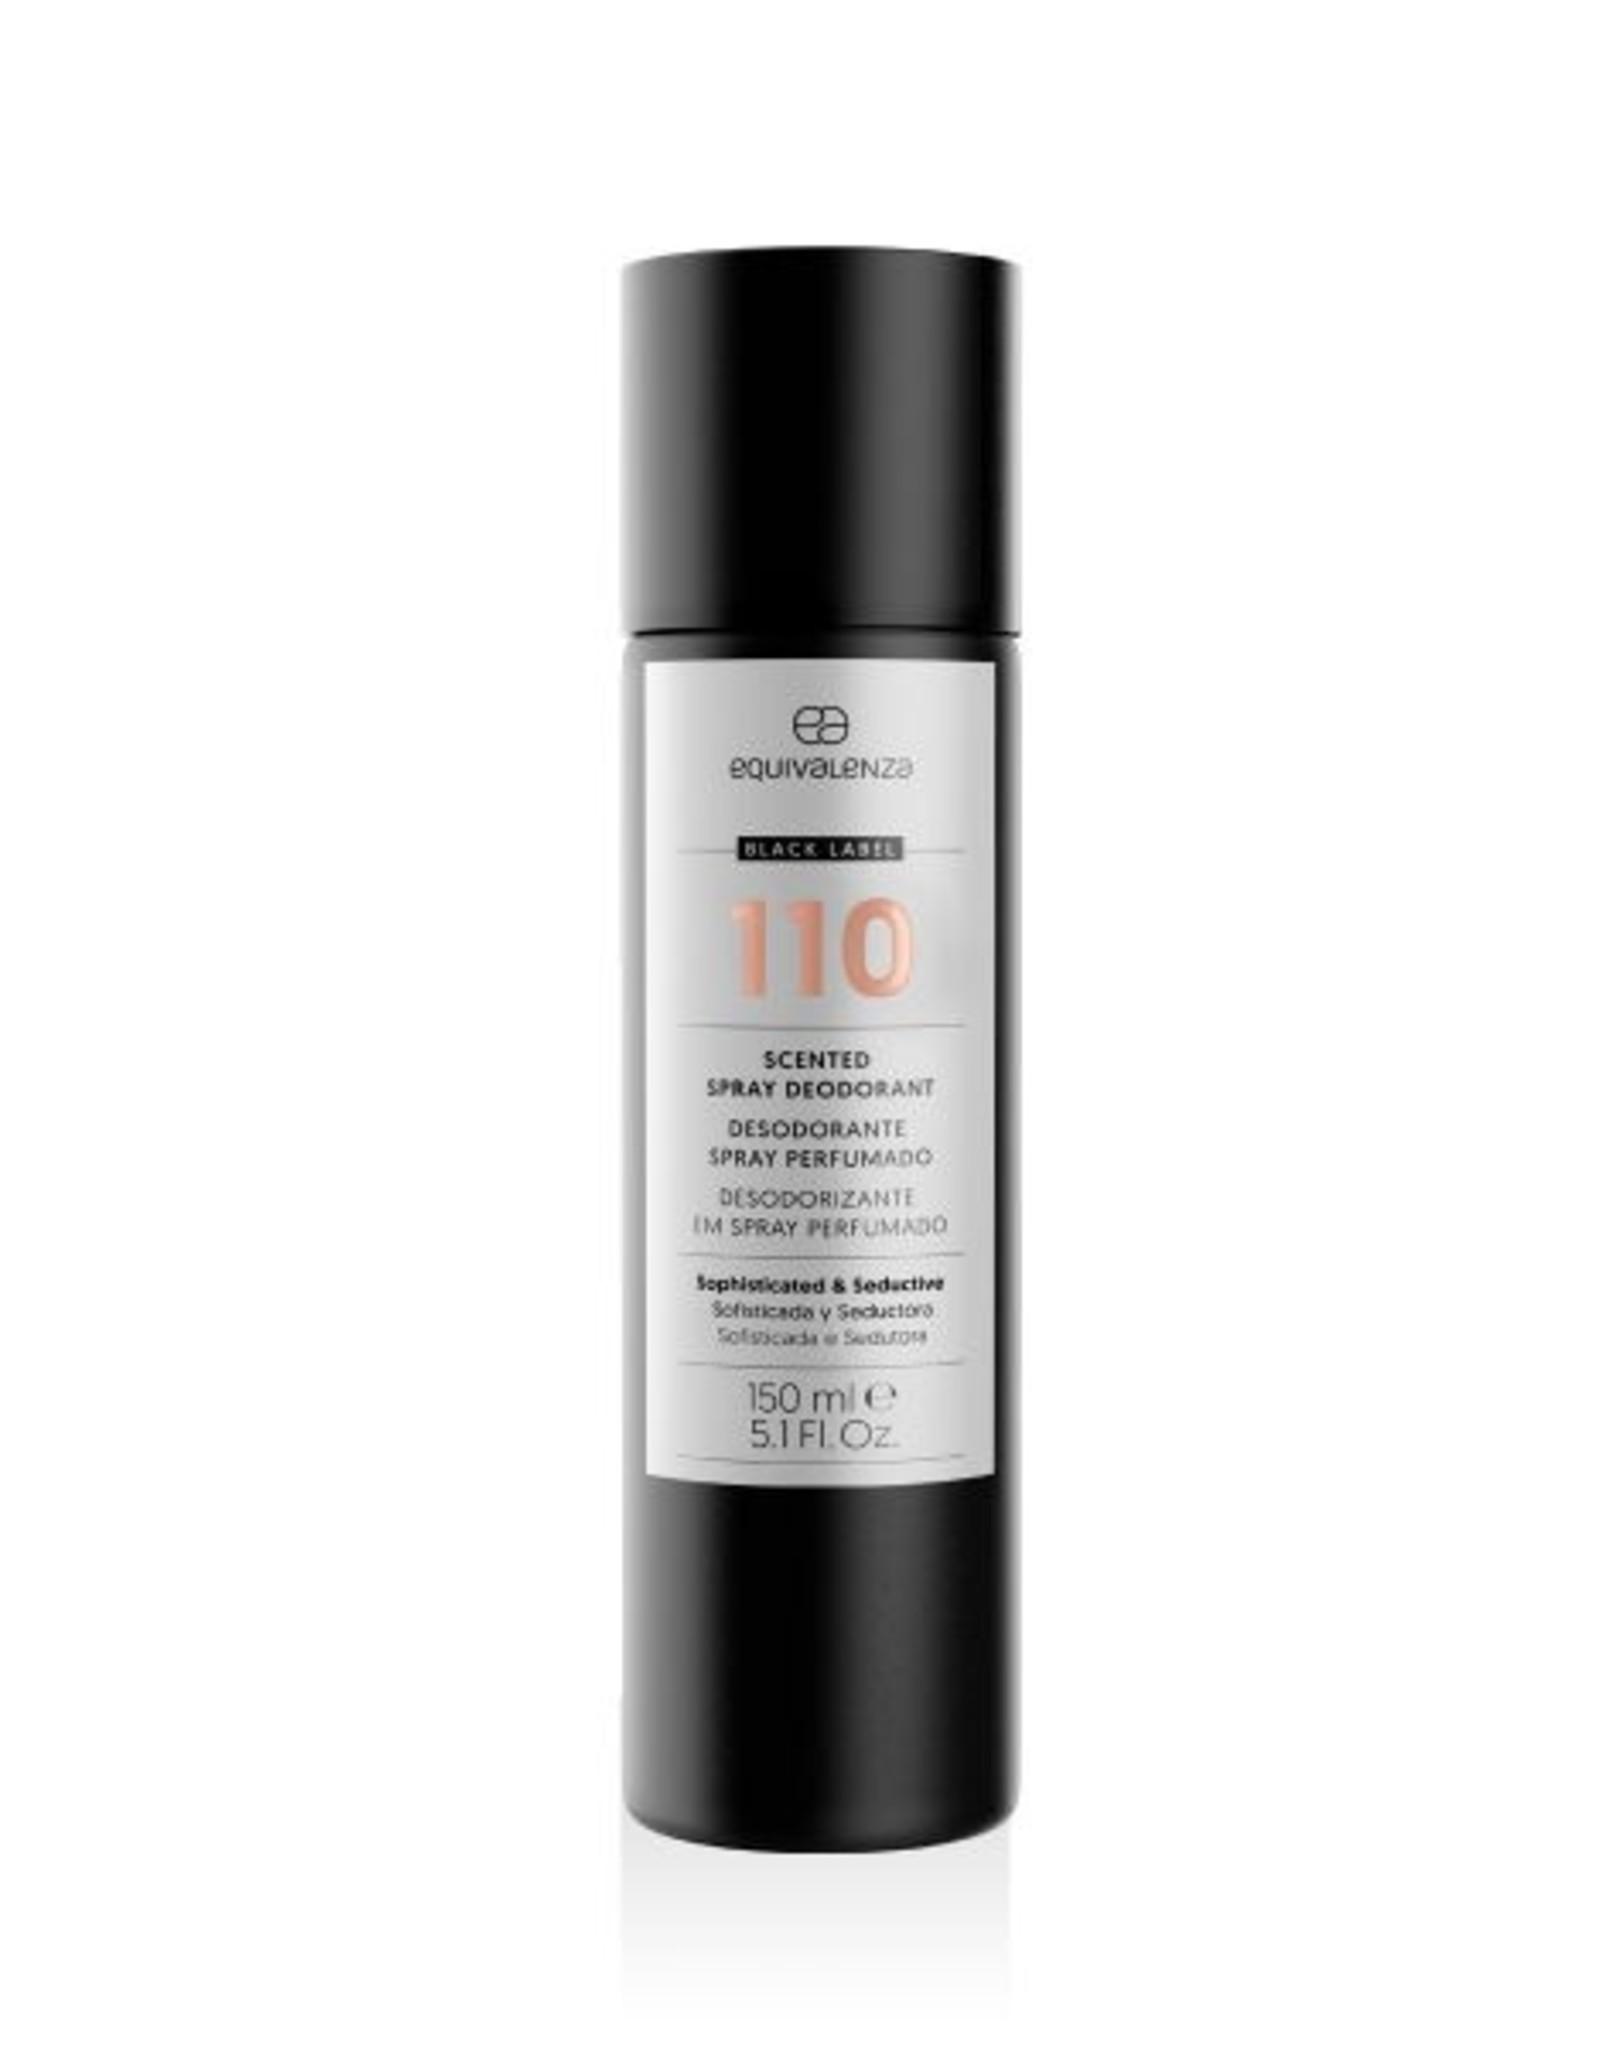 Equivalenza Black Label Deodorant 110